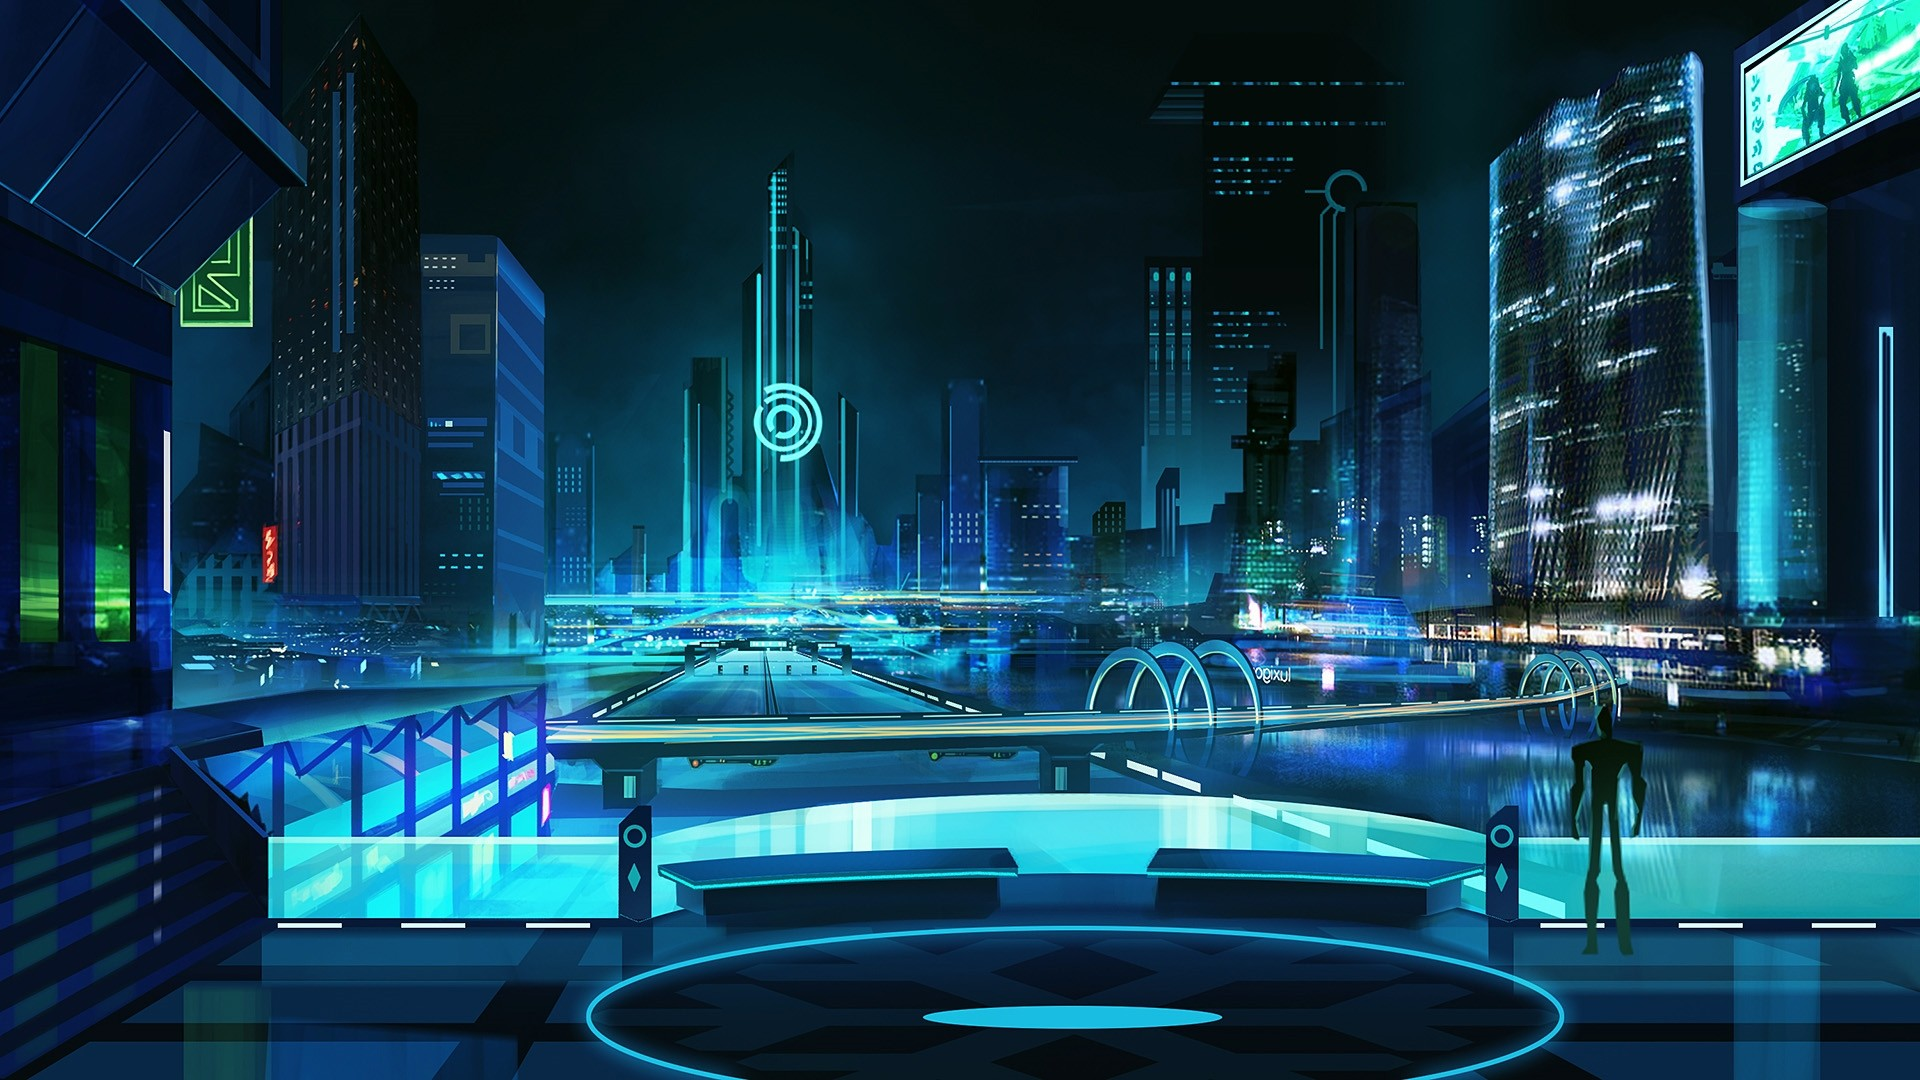 Futuristic hd desktop wallpaper